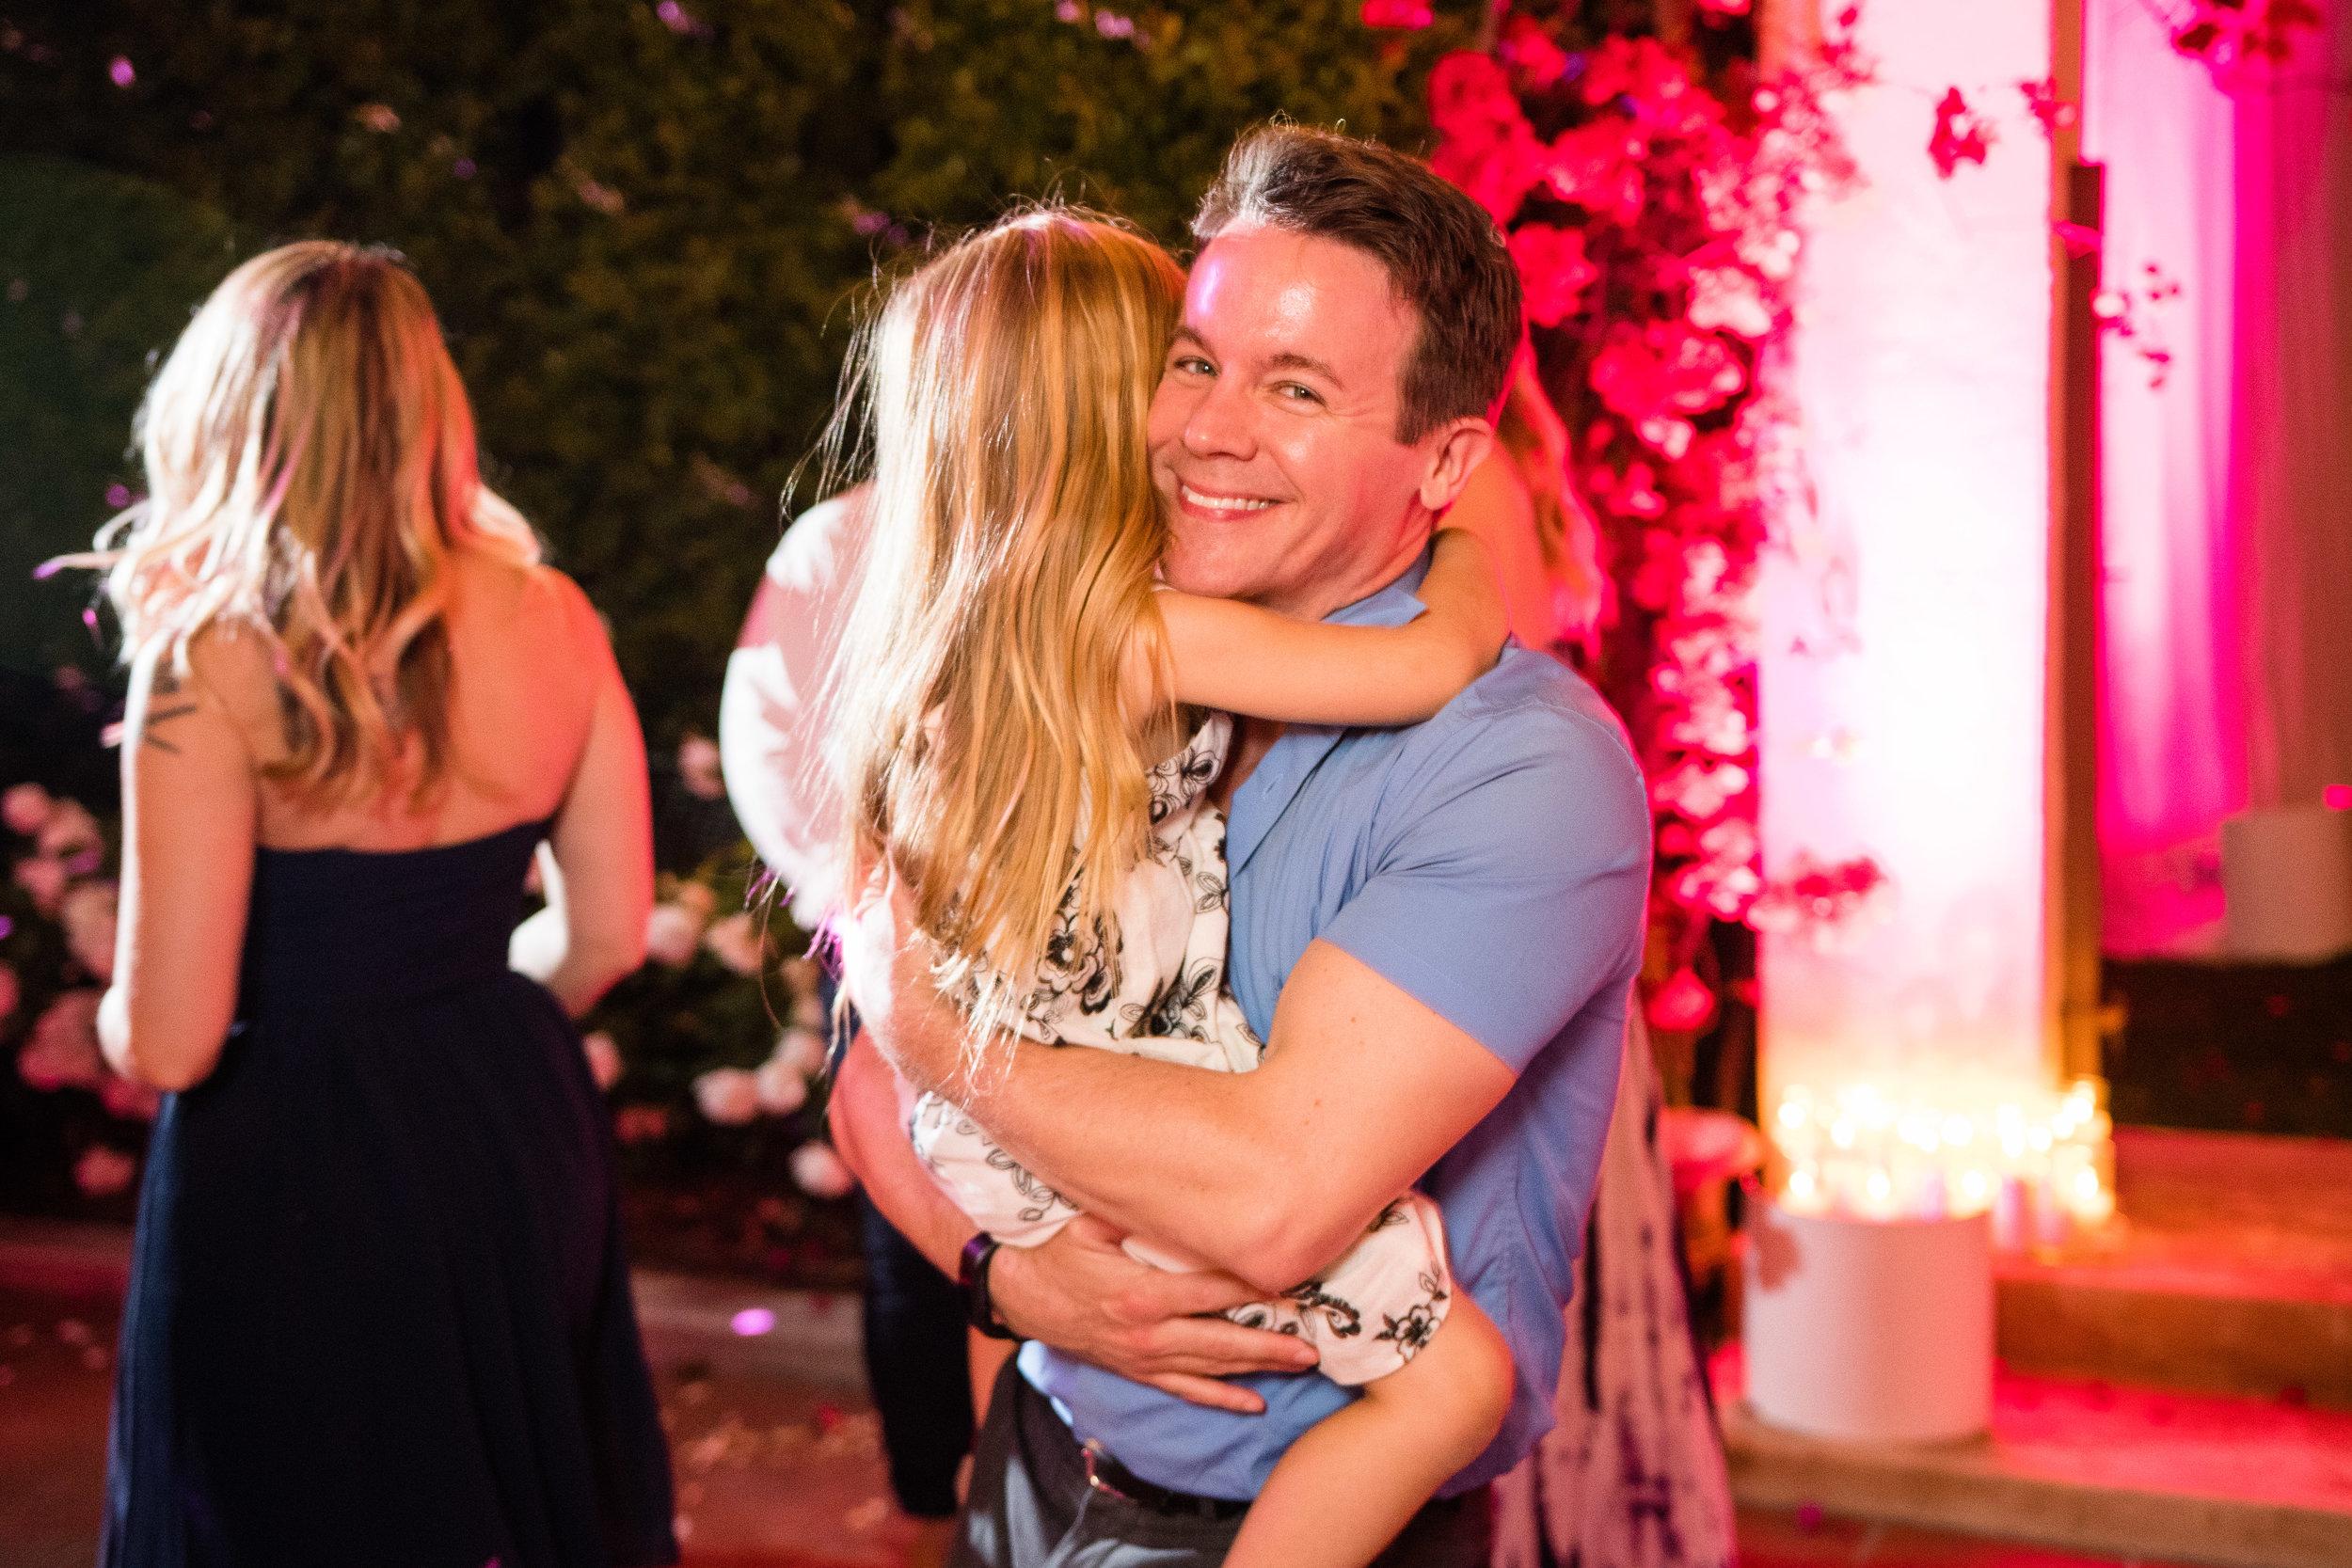 Vibrant Fiesta Backyard Wedding Reception daddy daughter dance.jpg